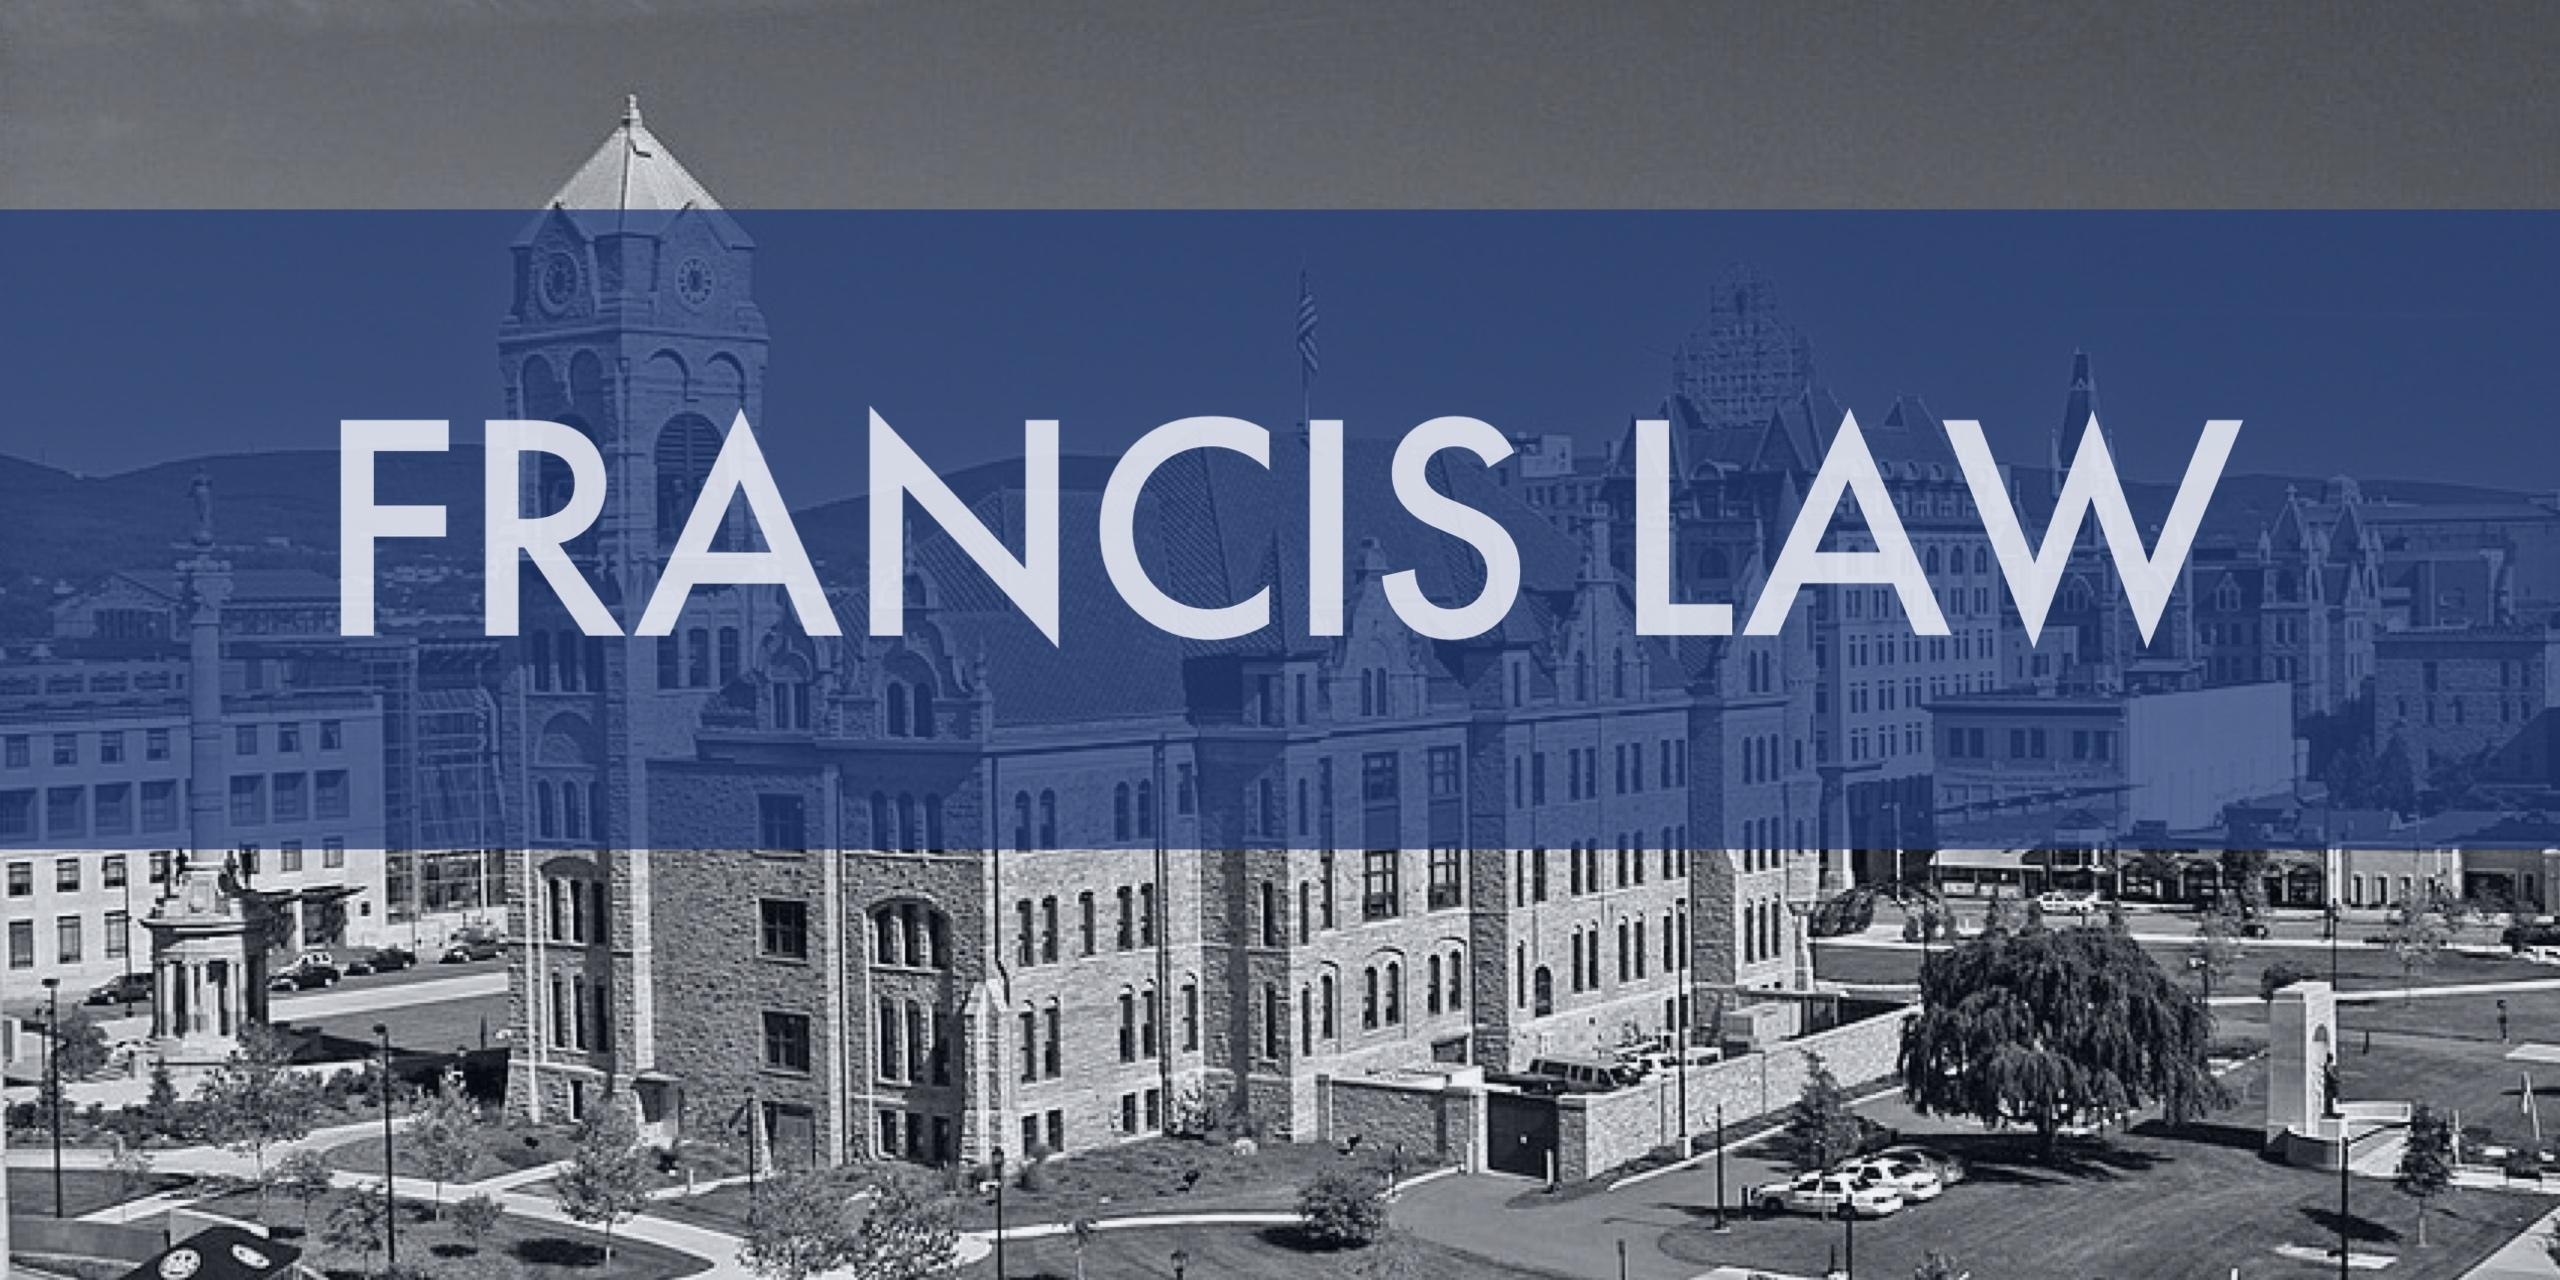 Francis Law